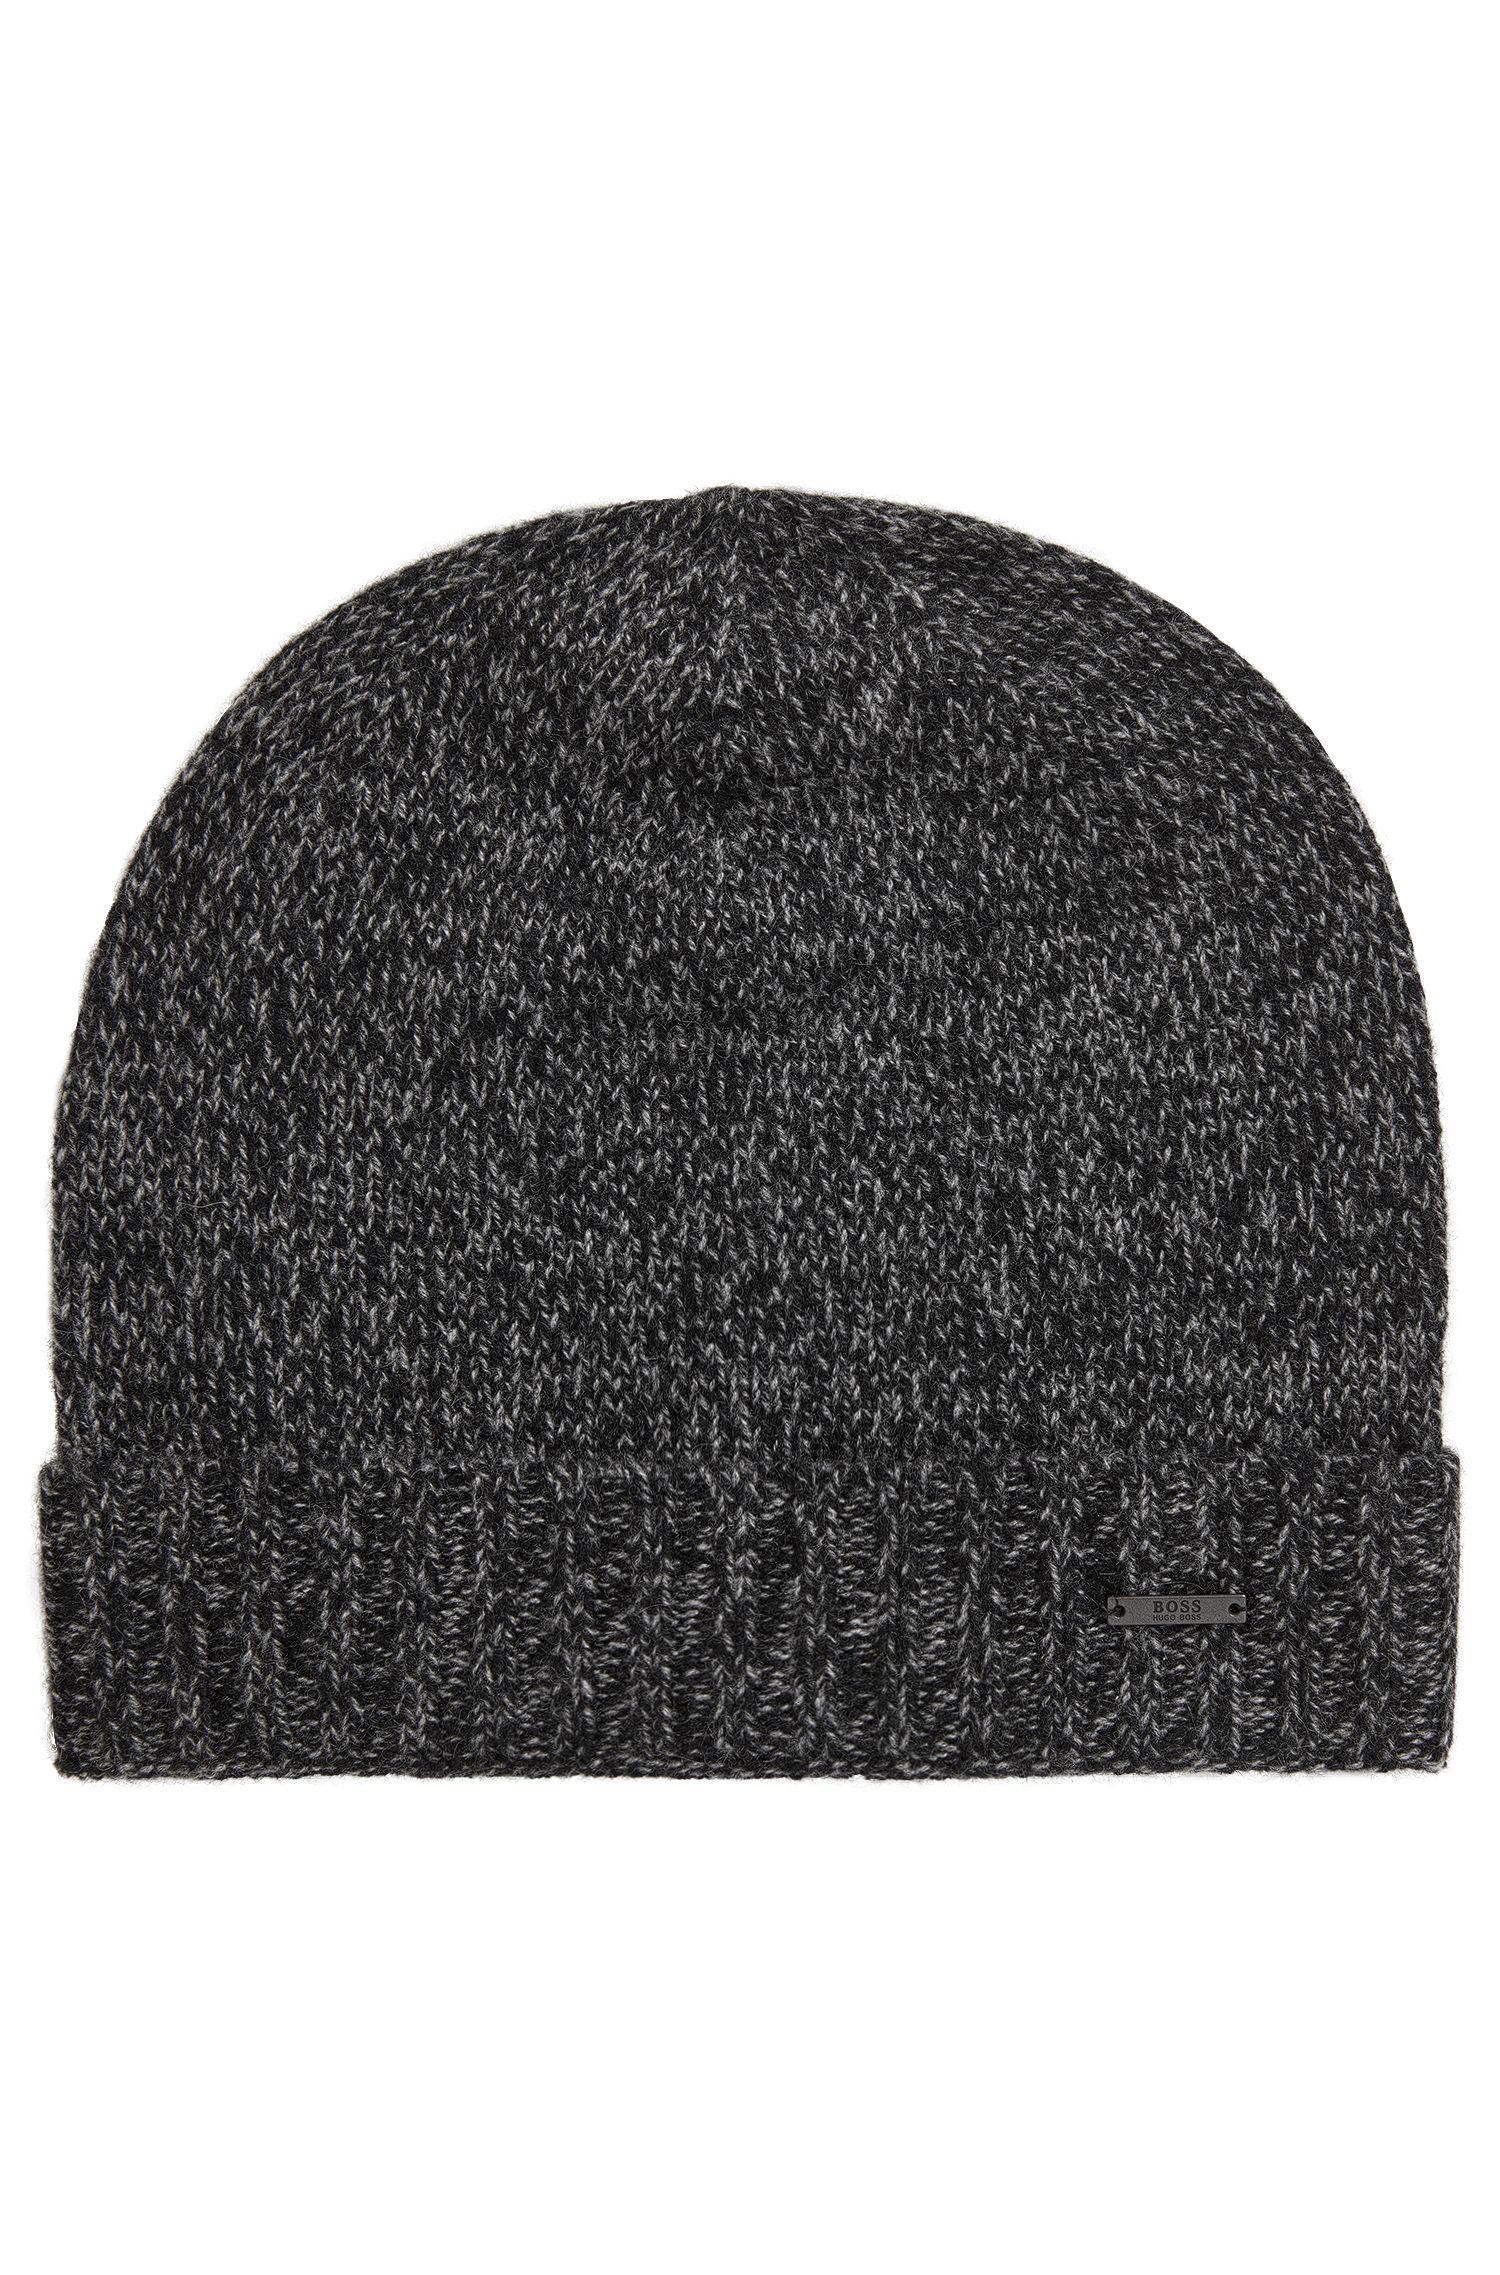 Beanie hat in mouliné cashmere